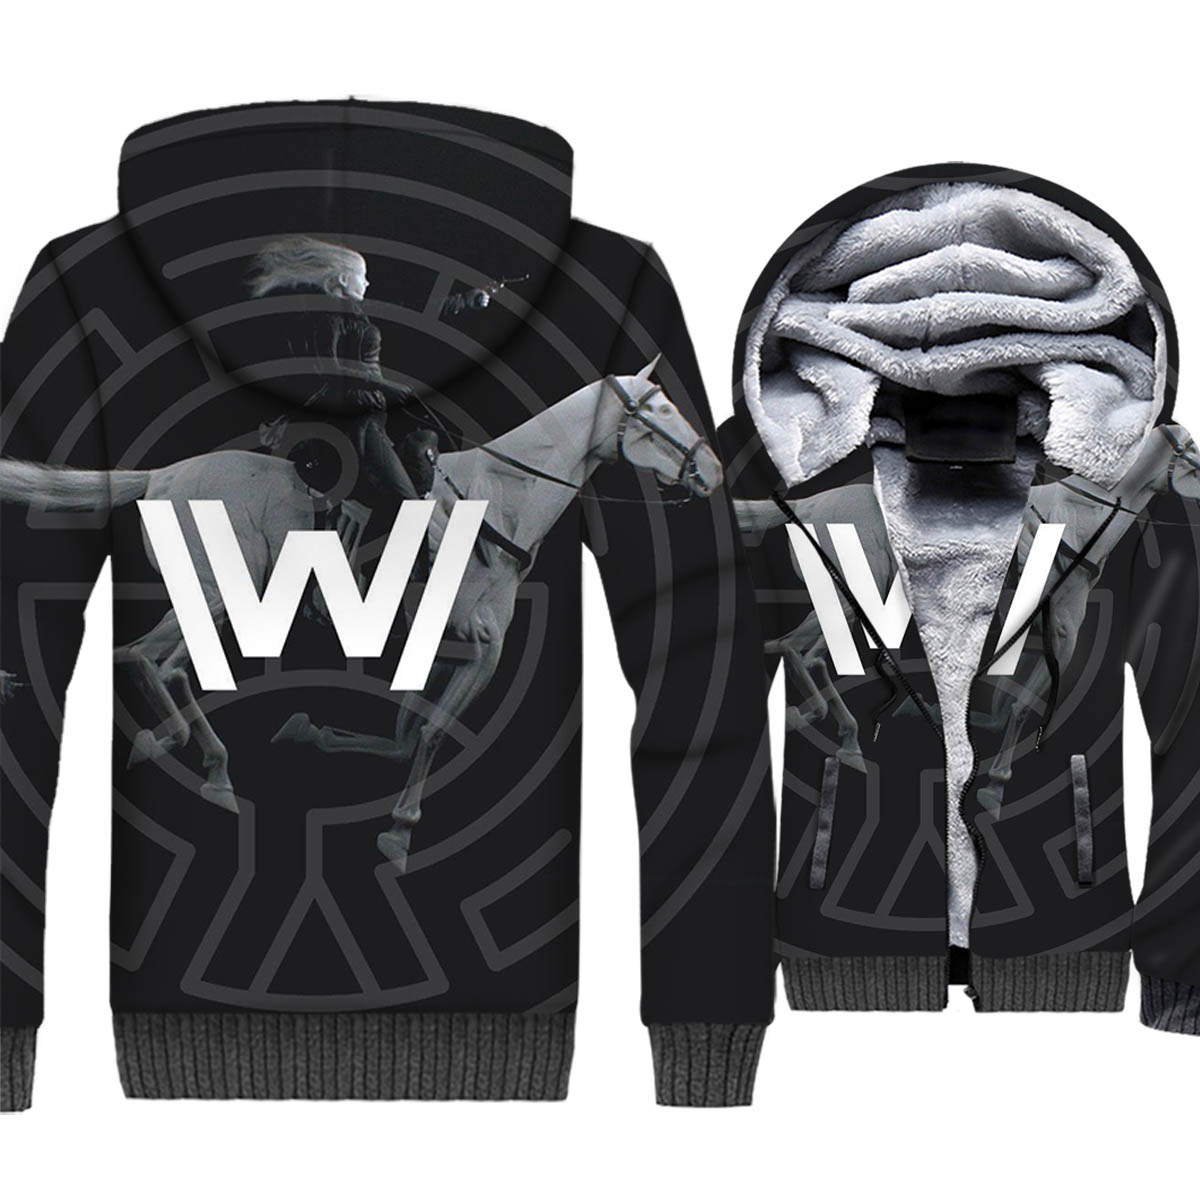 sportswear harajuku plus tracksuits winter casual wool liner zipper hoodies 2018 new hot TV series Westworld jackets coats M 5XL